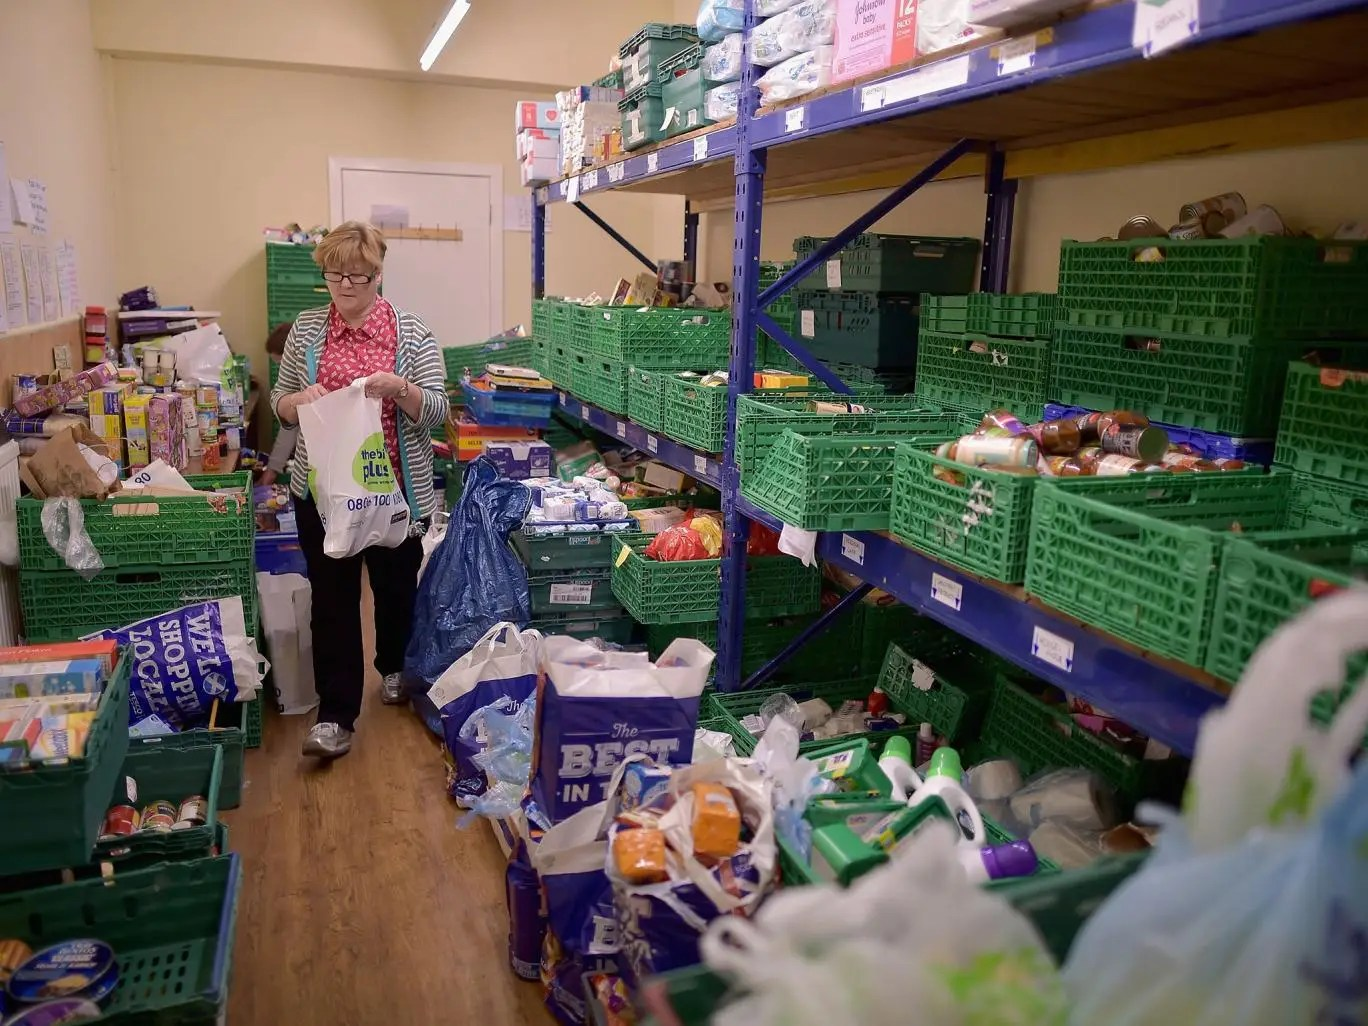 Volunteer Sandra Black packs food at the Trussell Trust Constitution Street food bank